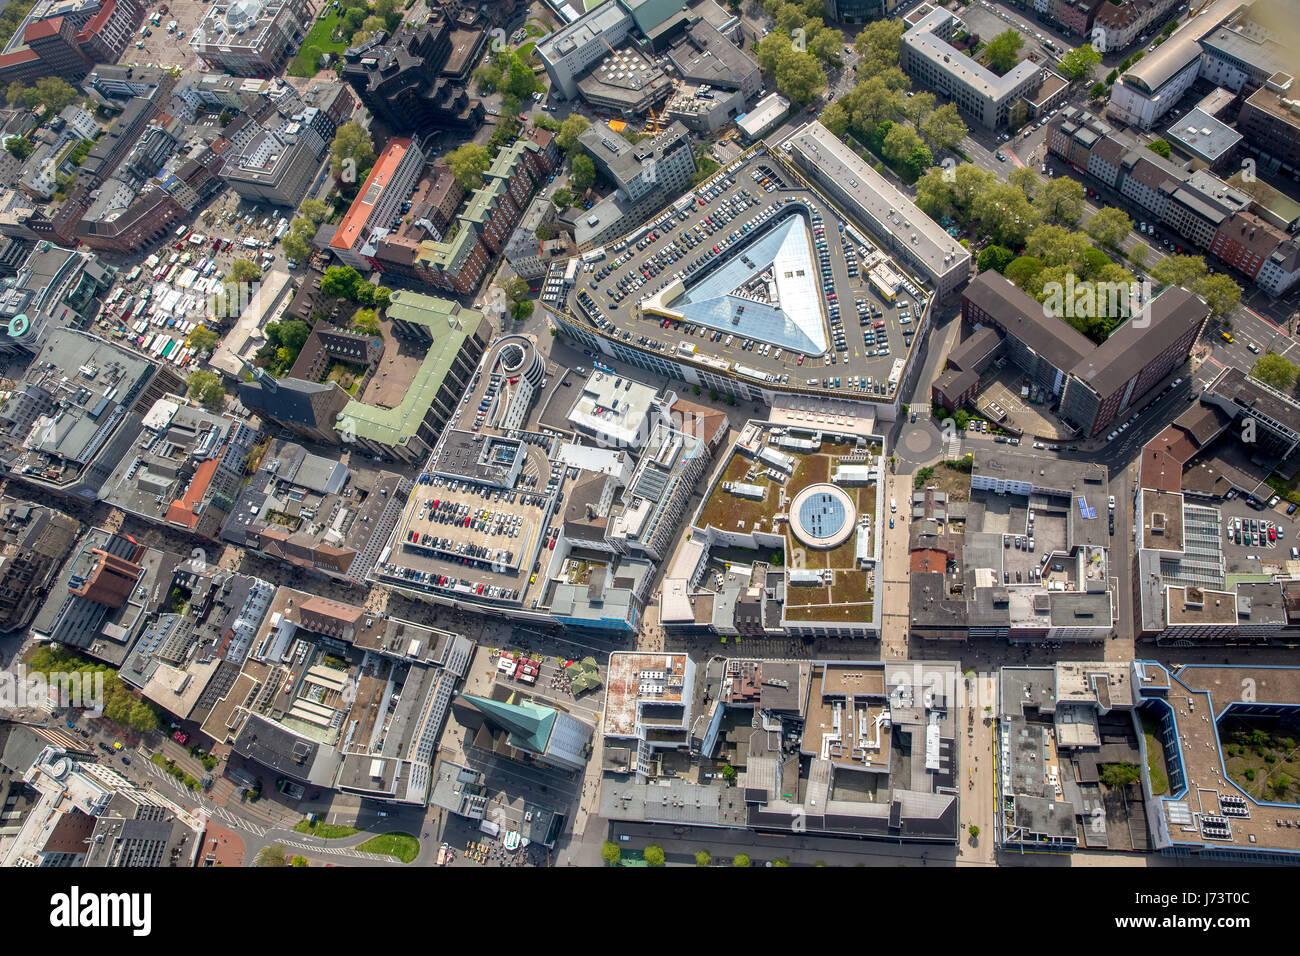 retail prices detailing big sale Westhellweg Stockfotos & Westhellweg Bilder - Alamy